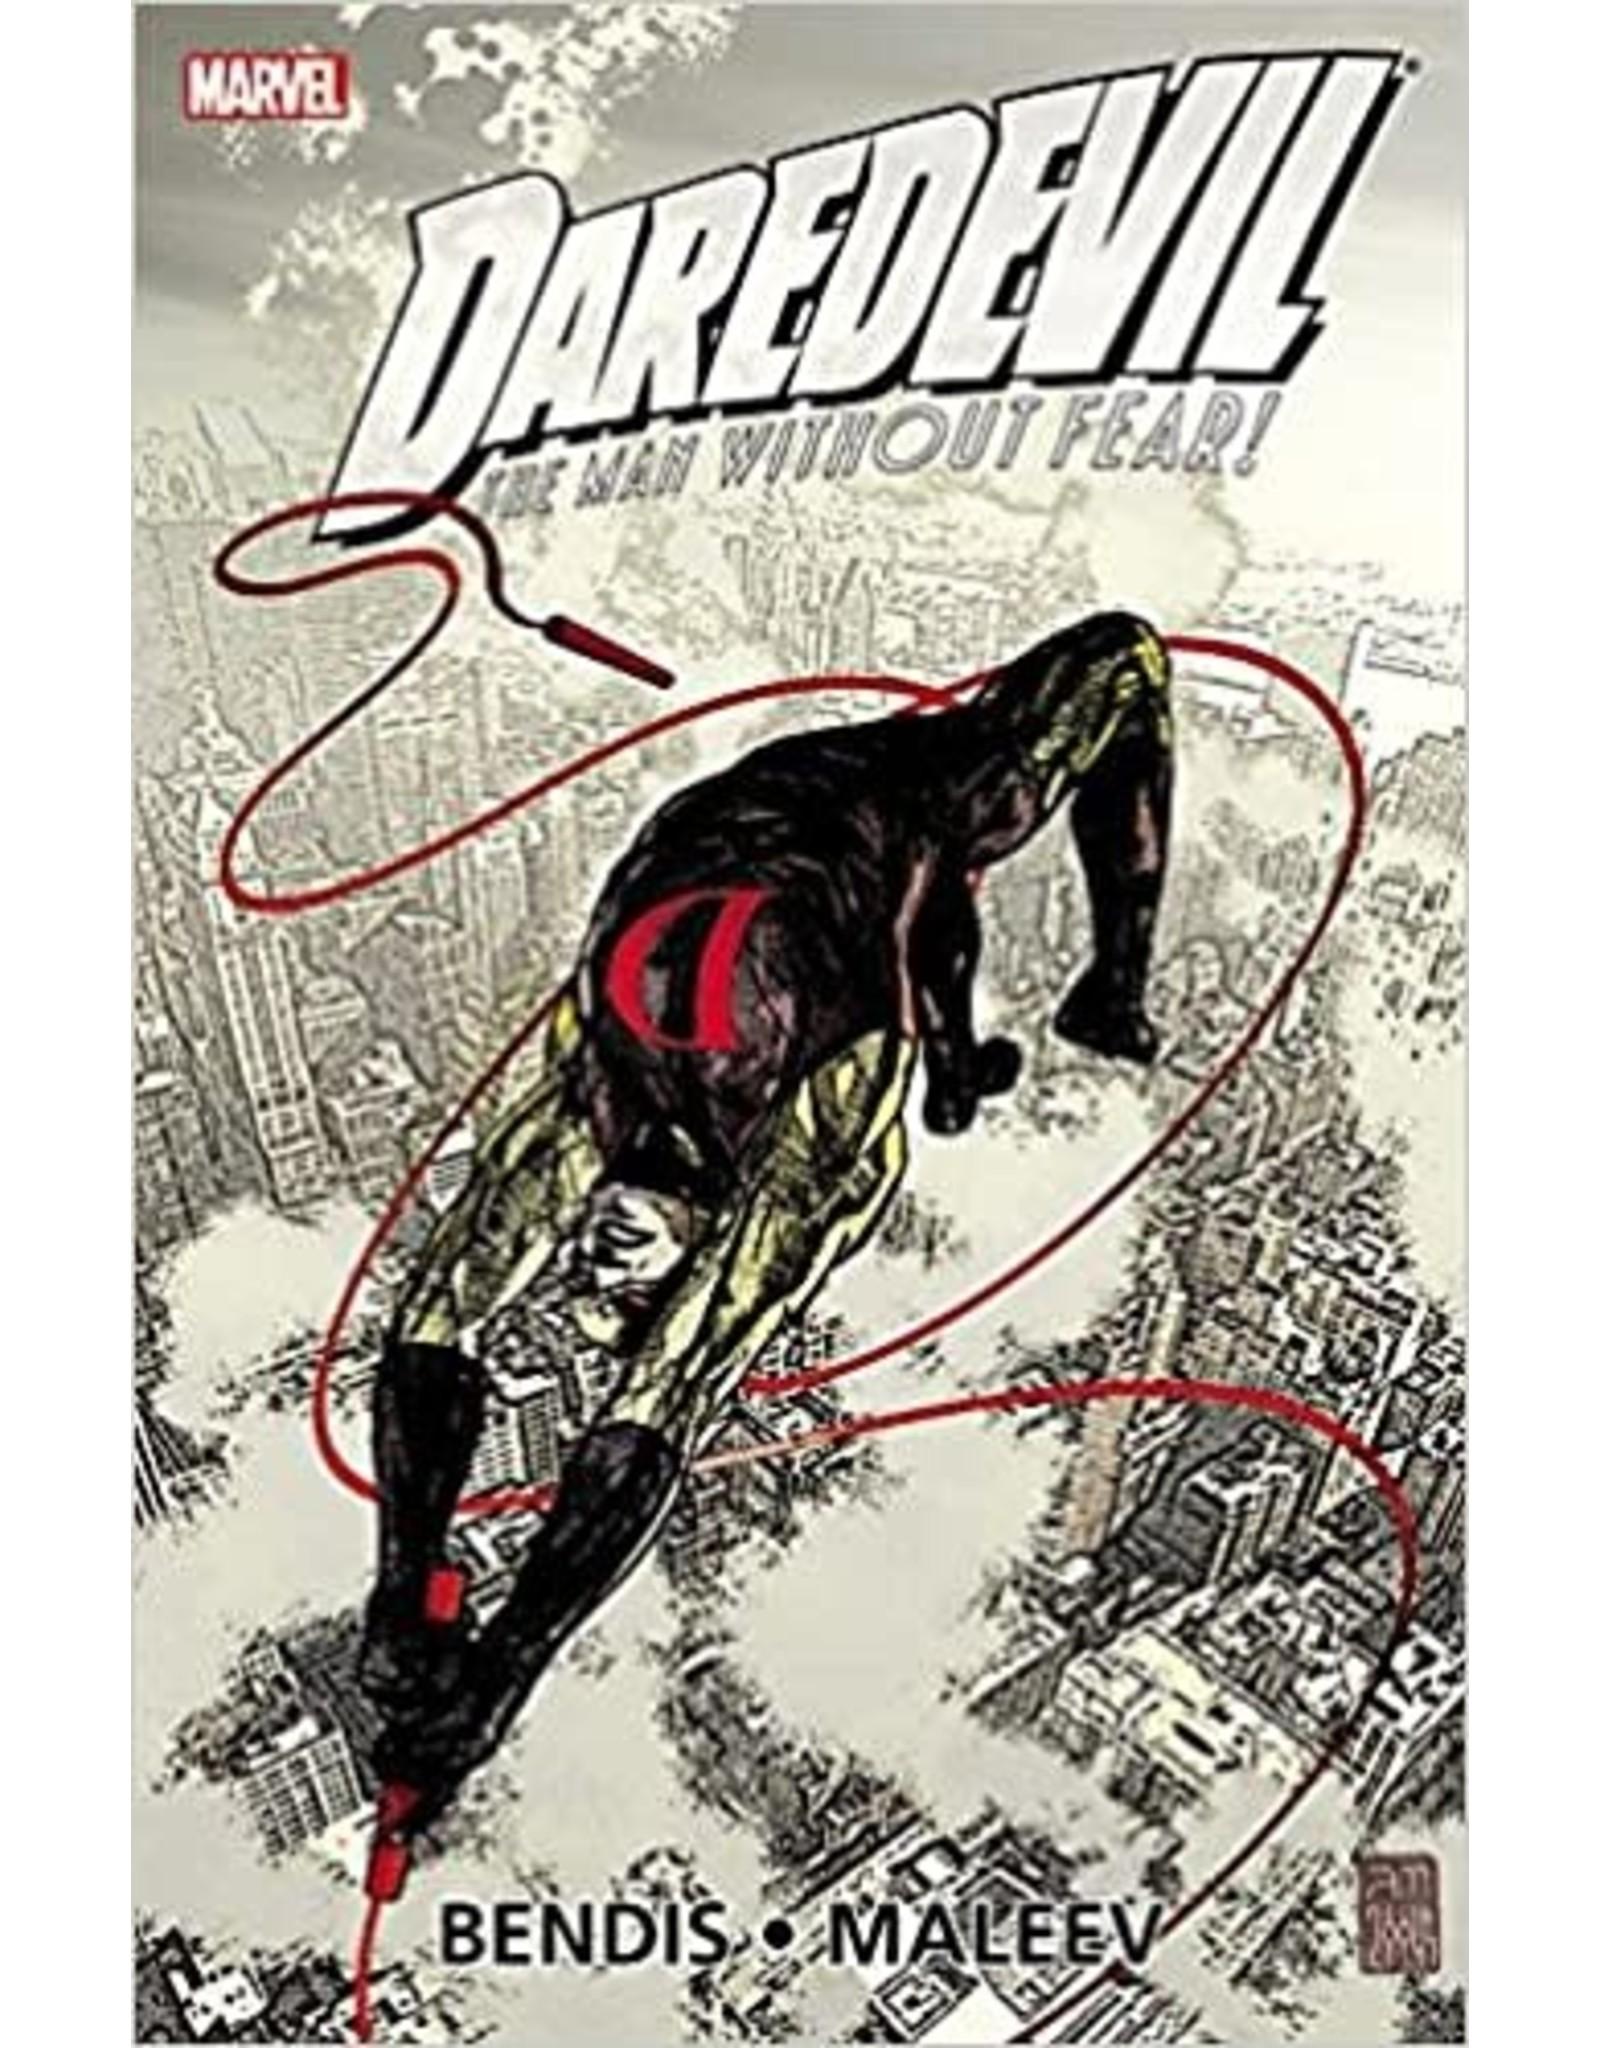 MARVEL COMICS DAREDEVIL BY BENDIS & MALEEV TP ULT COLL BOOK 03